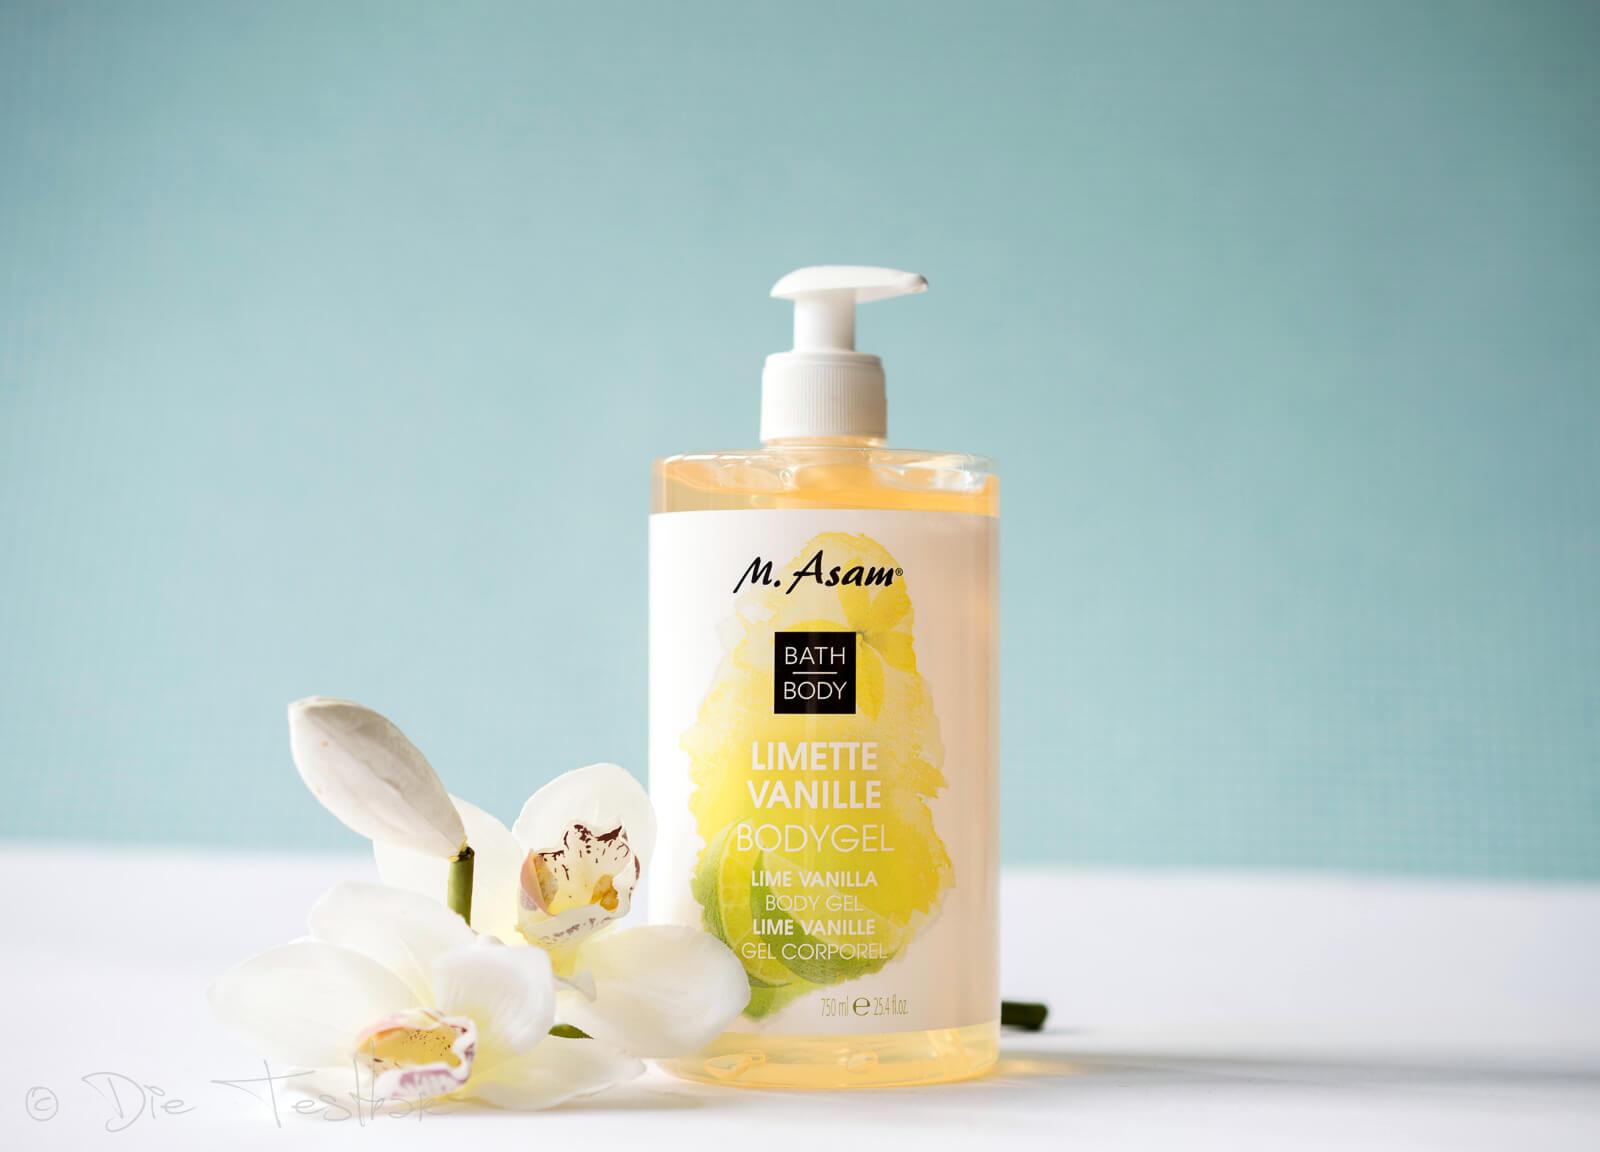 M. Asam Limette Vanille Aqua Lotion